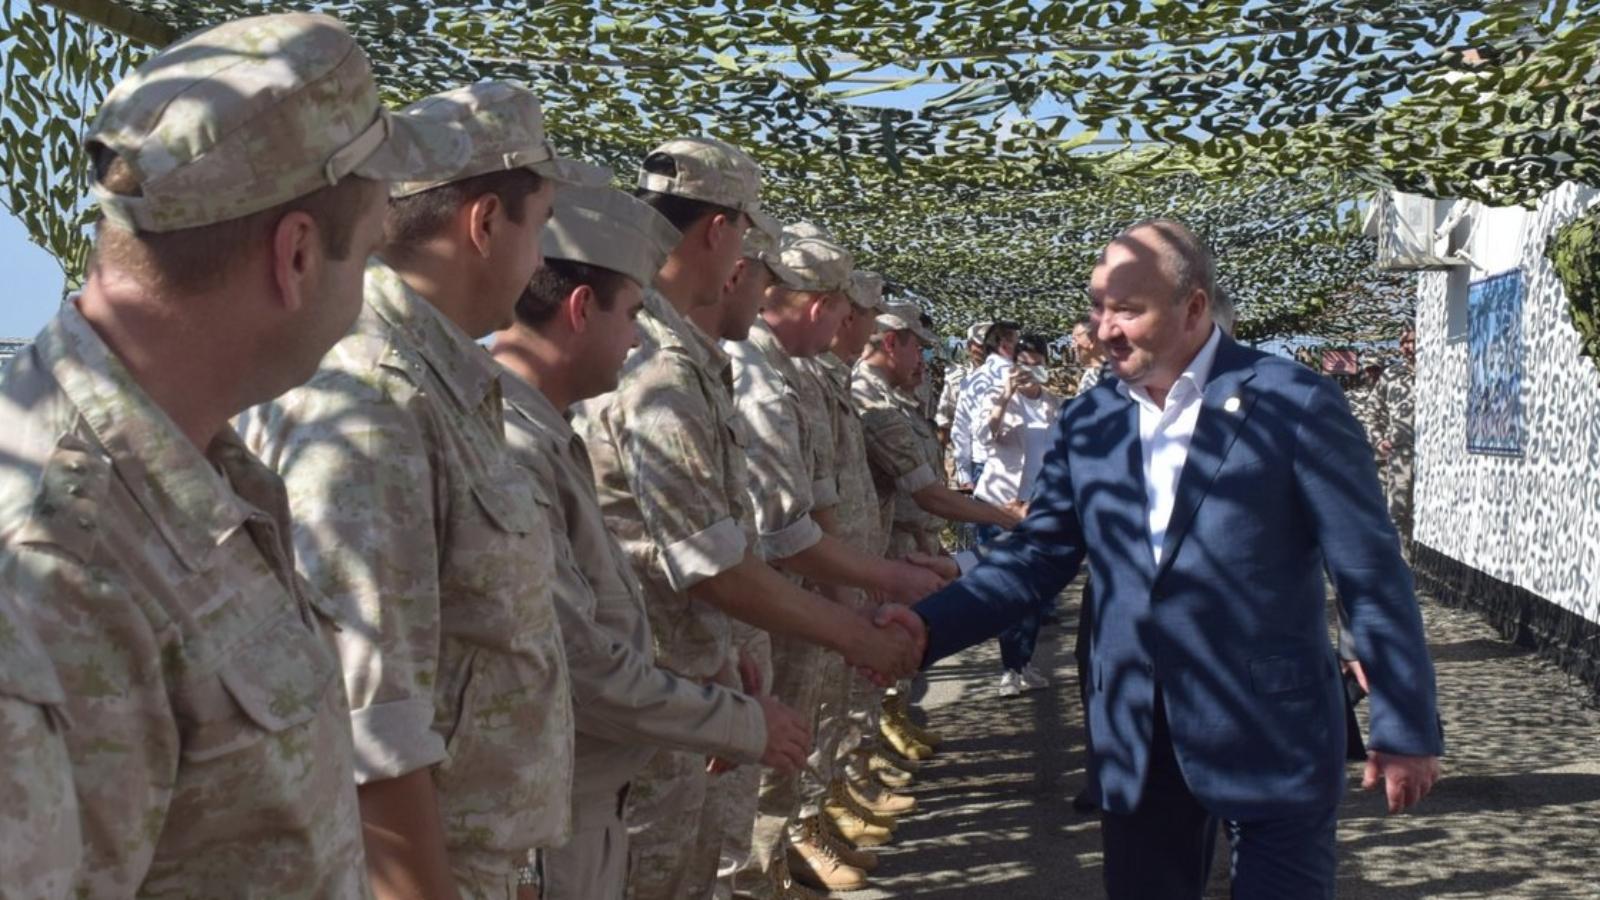 Фото: пресс-служба Полпредства Татарстана в России